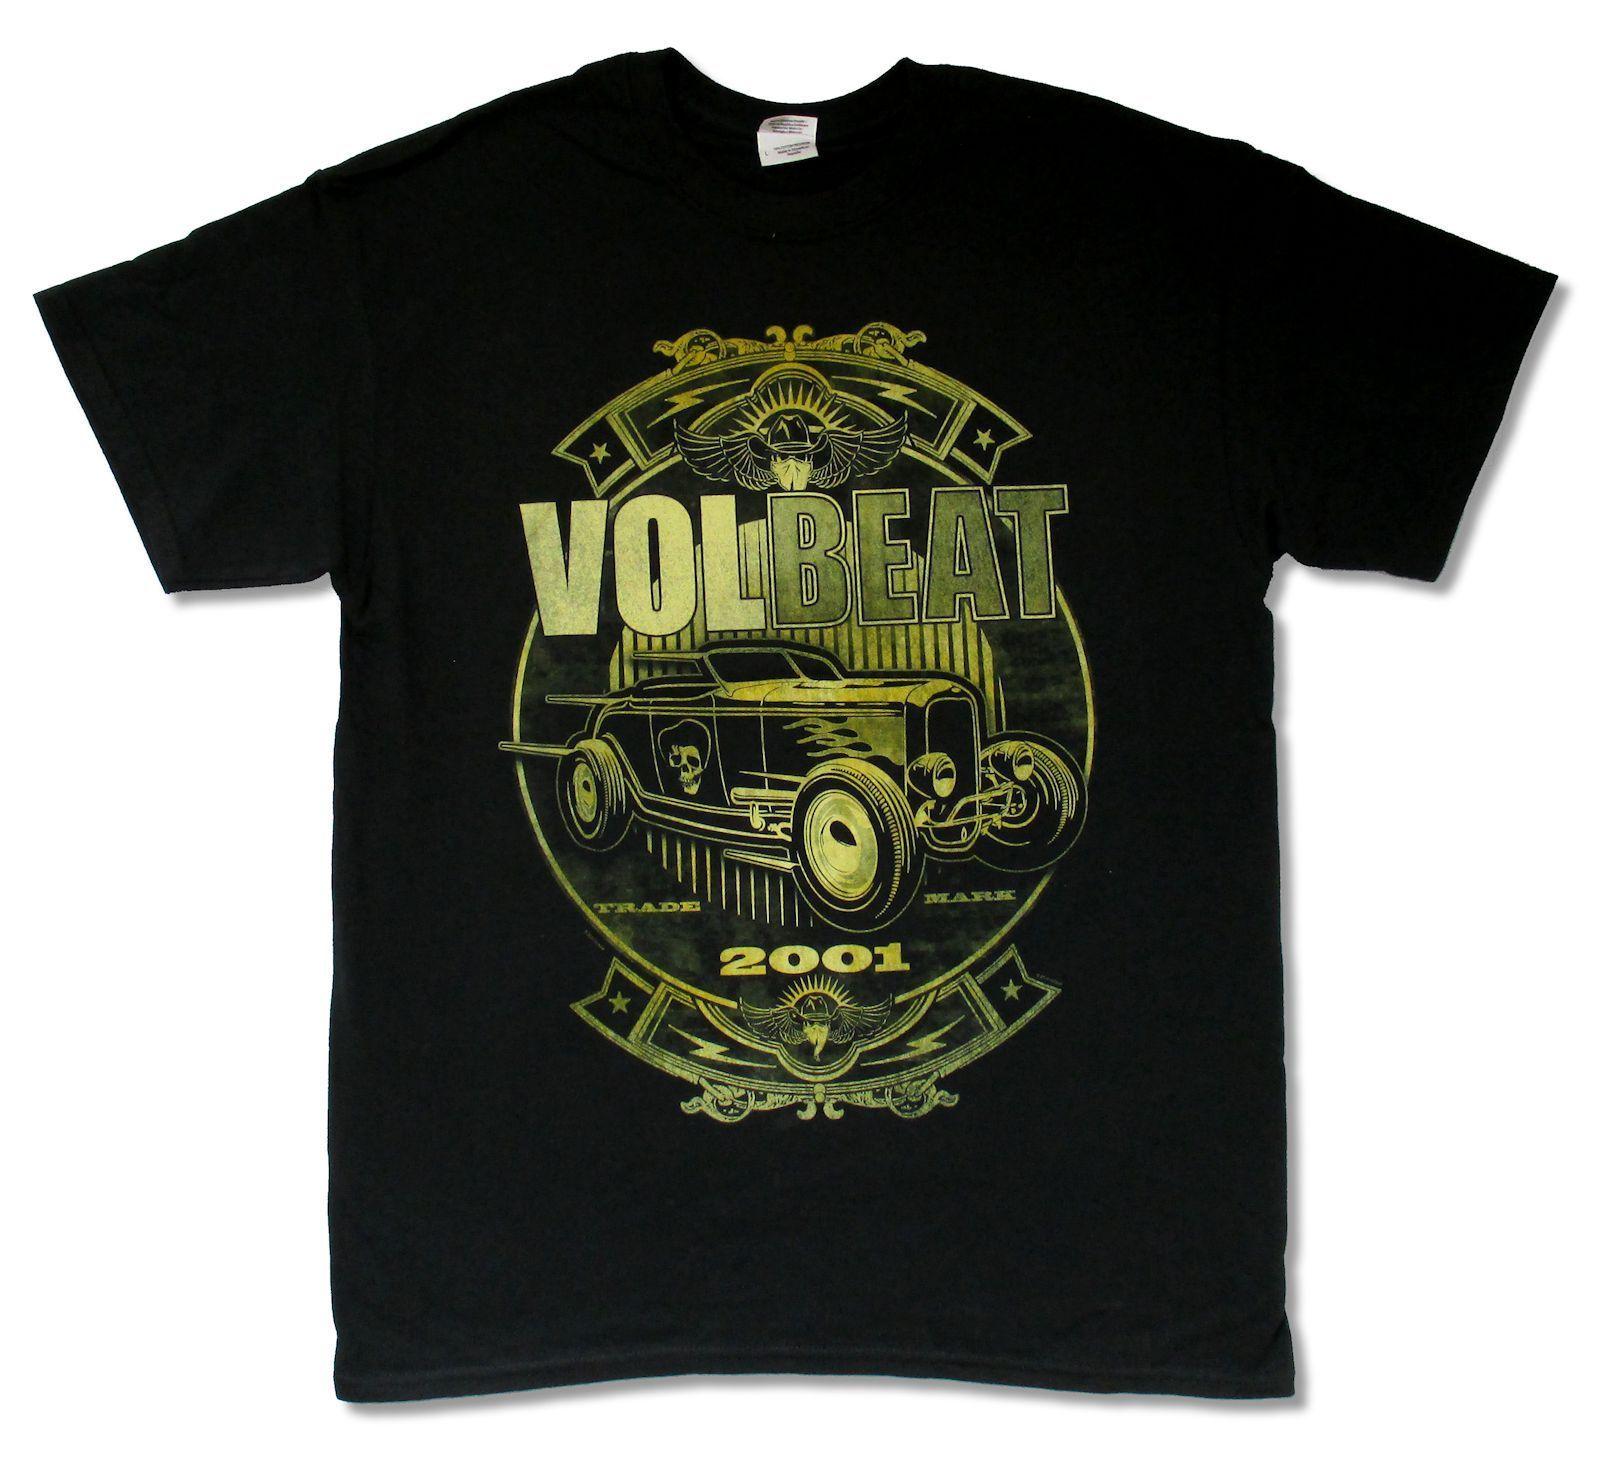 T-Shirt 2018 Fashion Men top tee Volbeat Custom Shop Car Black T Shirt New Official Band Merch